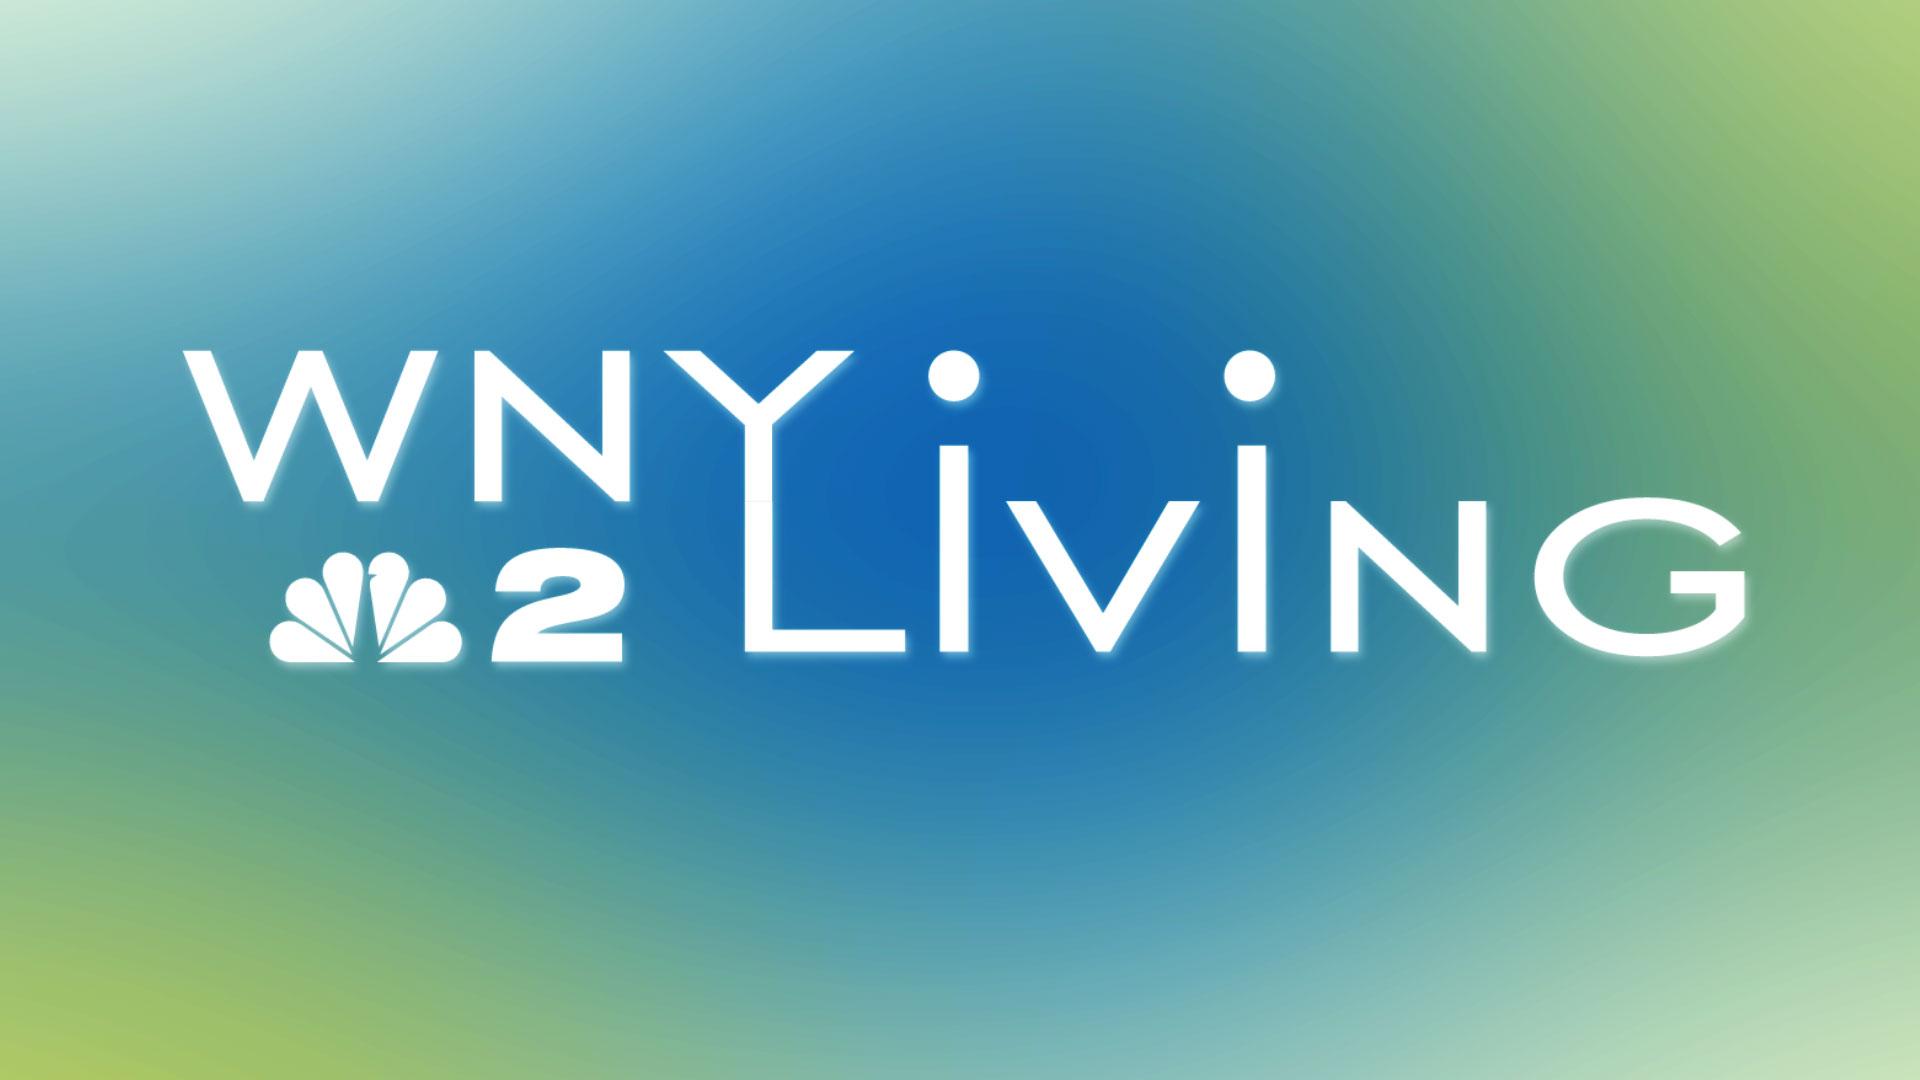 WNY Living